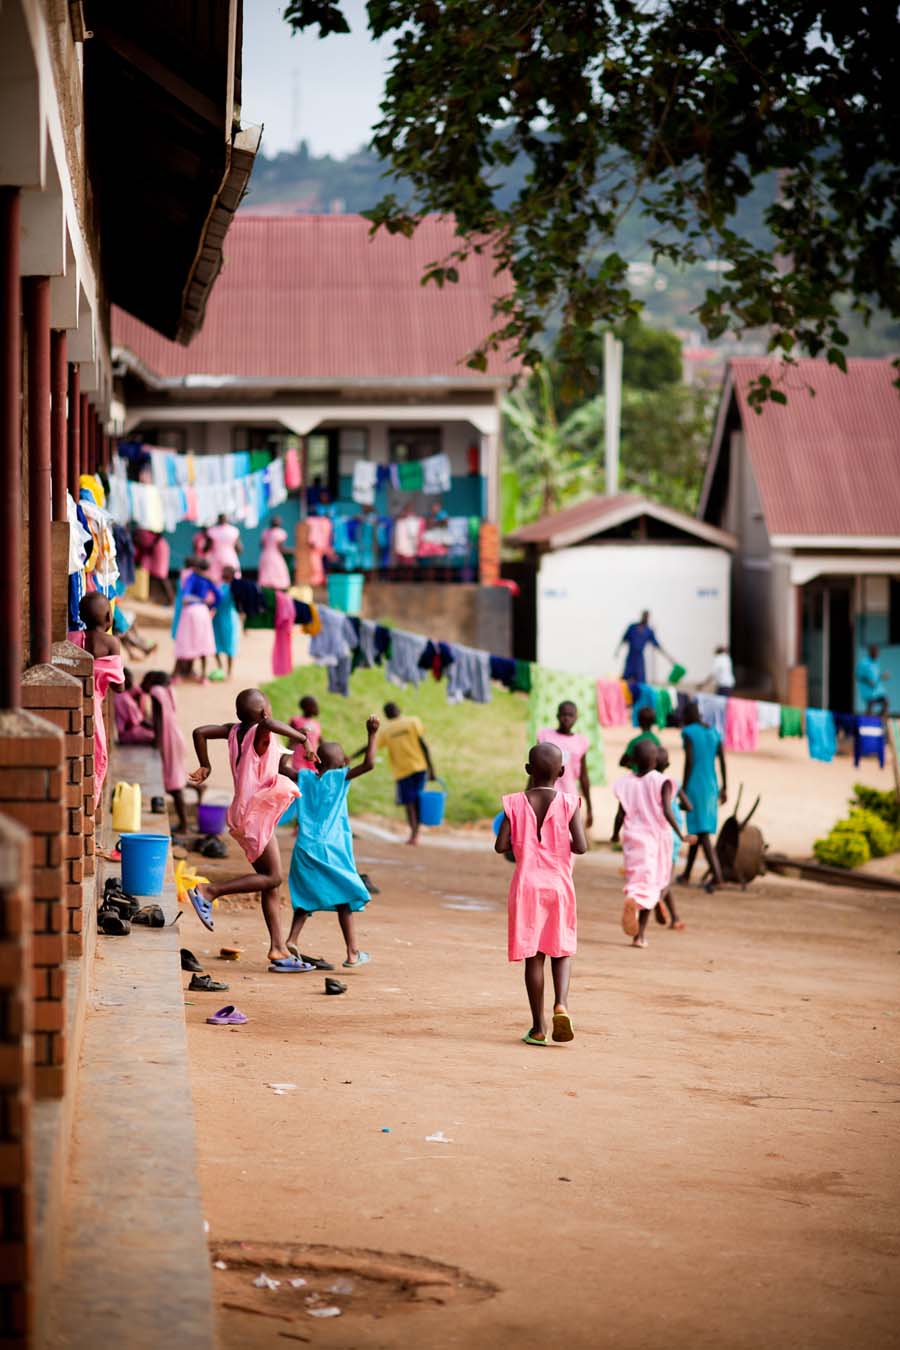 jessicadavisphotography.com | Jessica Davis Photography | Portrait Work in Uganda| Travel Photographer | World Event Photographs 3 (7).jpg